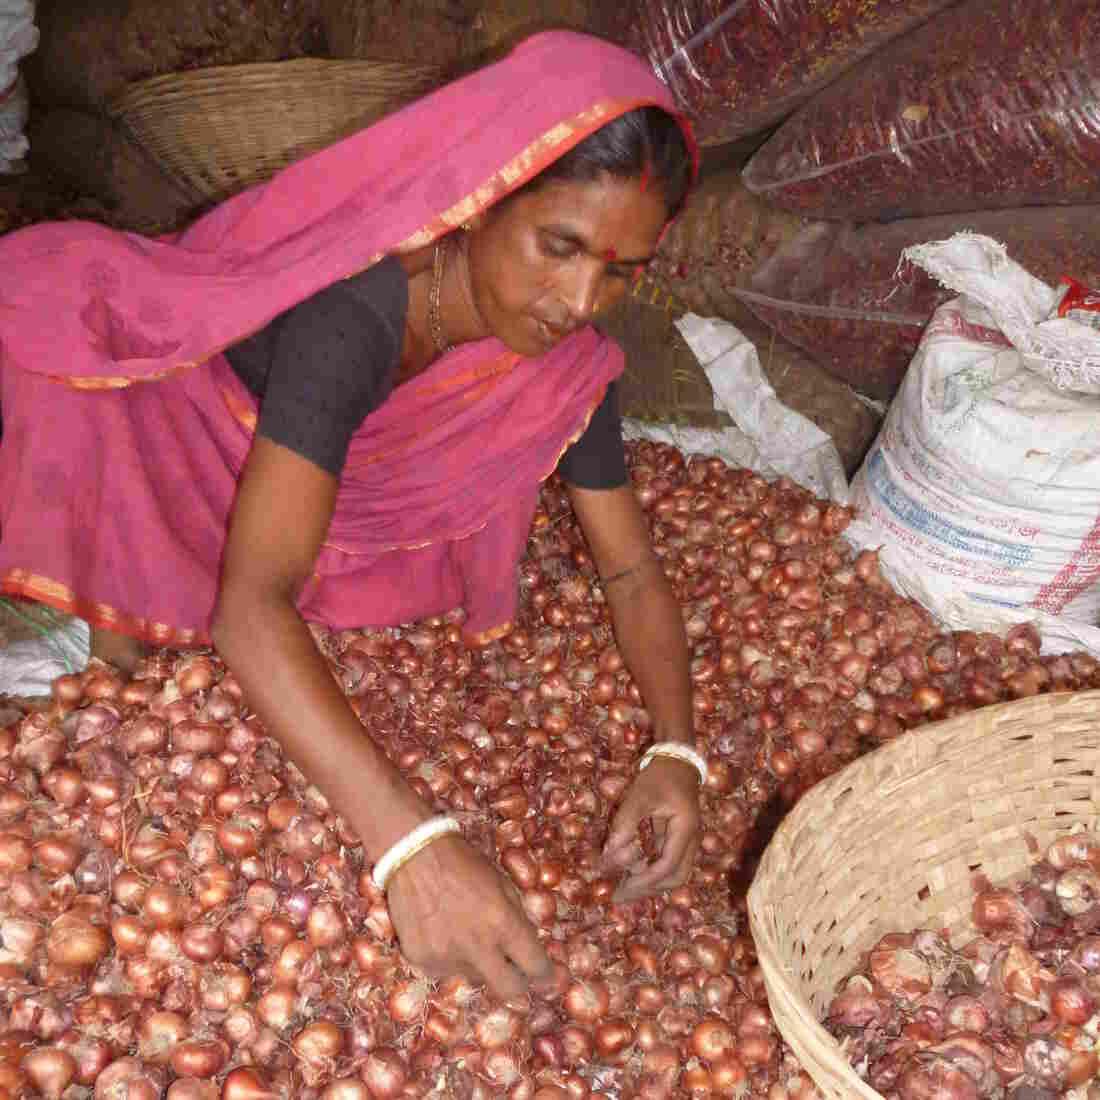 Kamala Rani sorts vegetables at the market in Kapasia, Bangladesh.